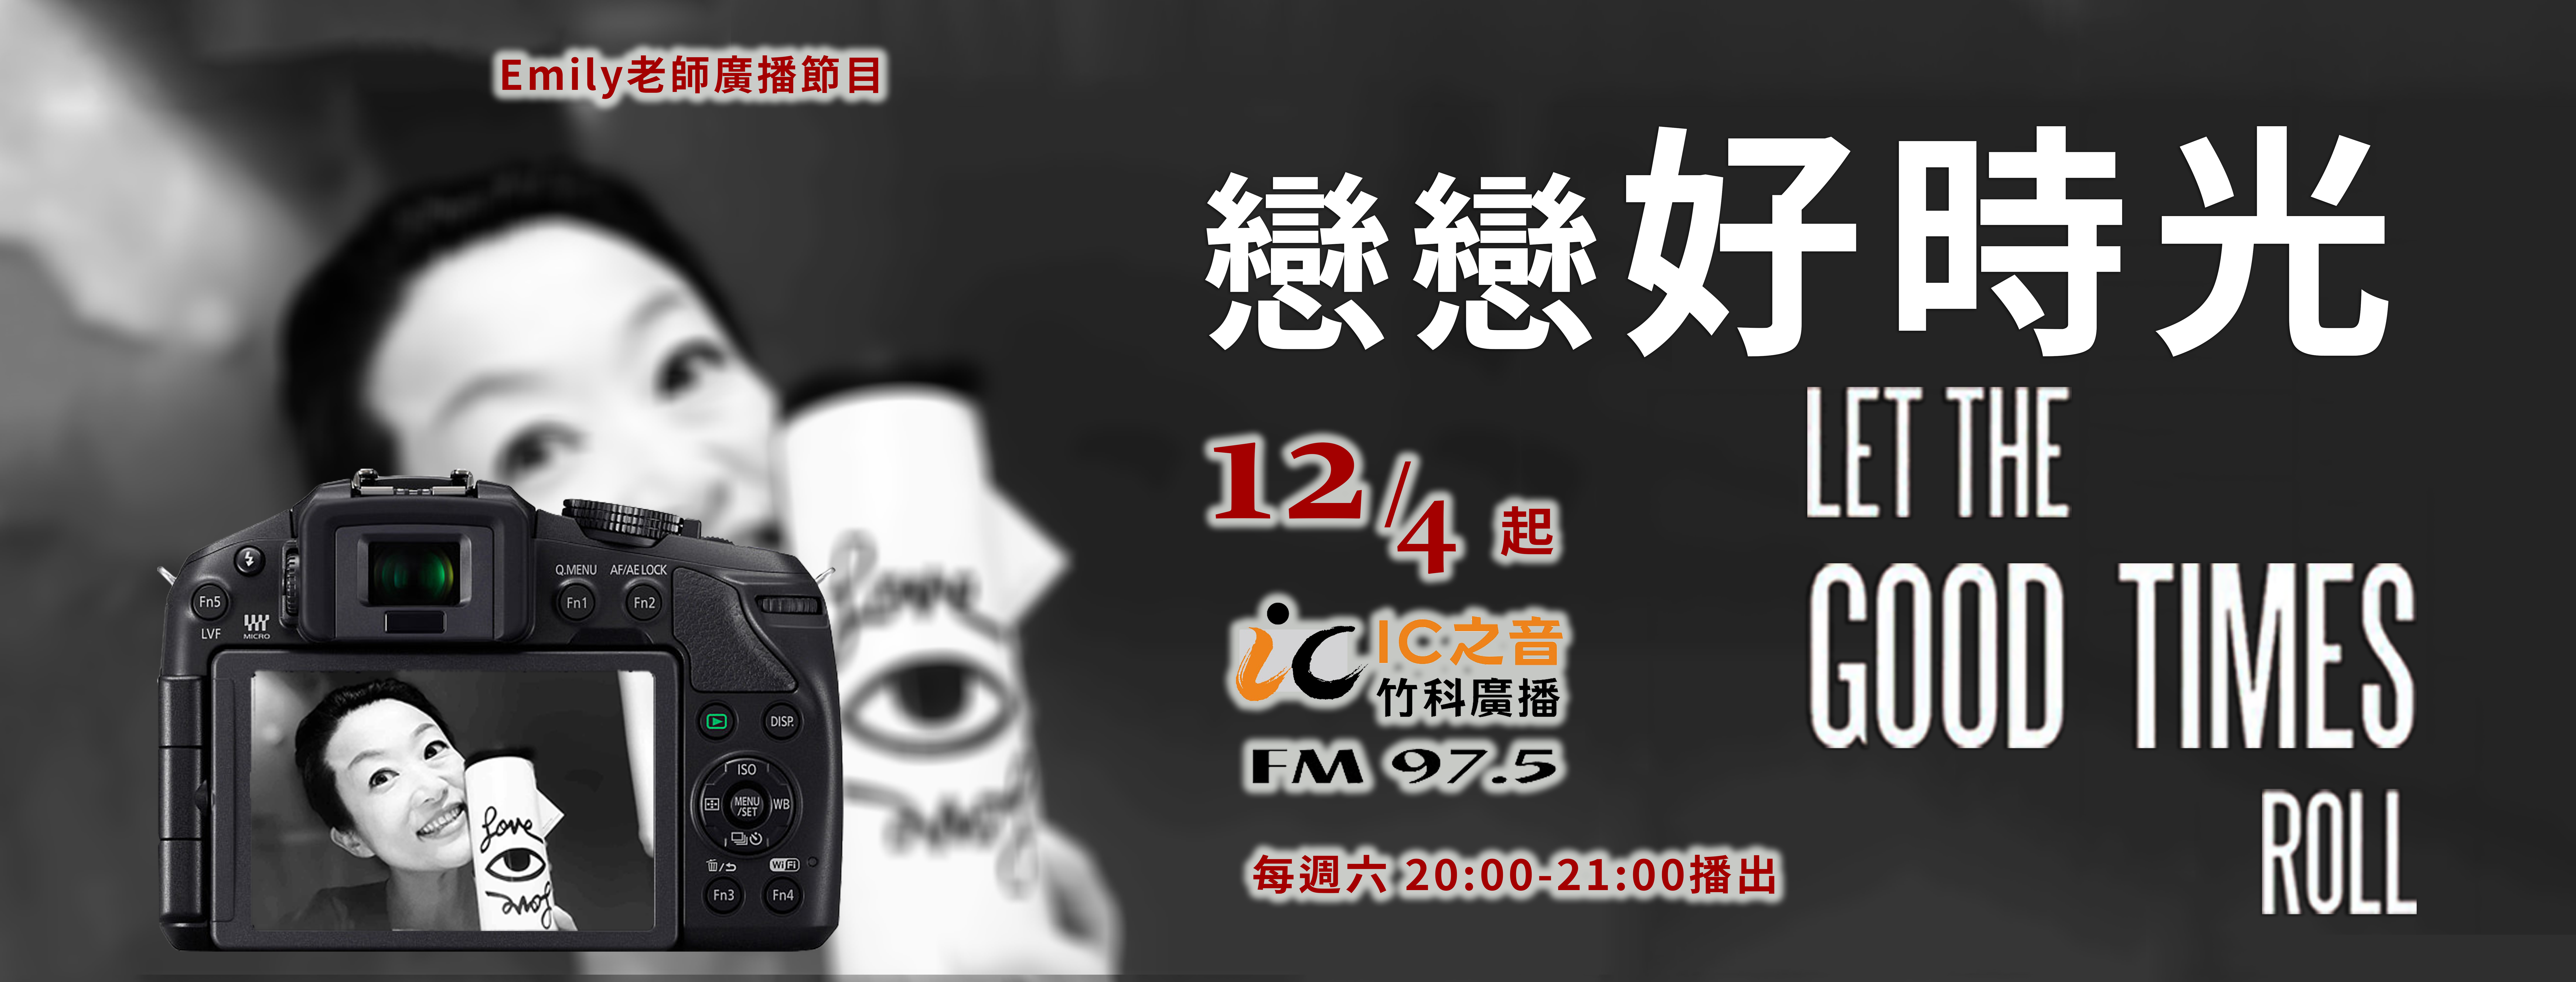 「Emily老師戀戀好時光」12/4起 FM 97.5 IC之音全新開播,歡迎收聽!